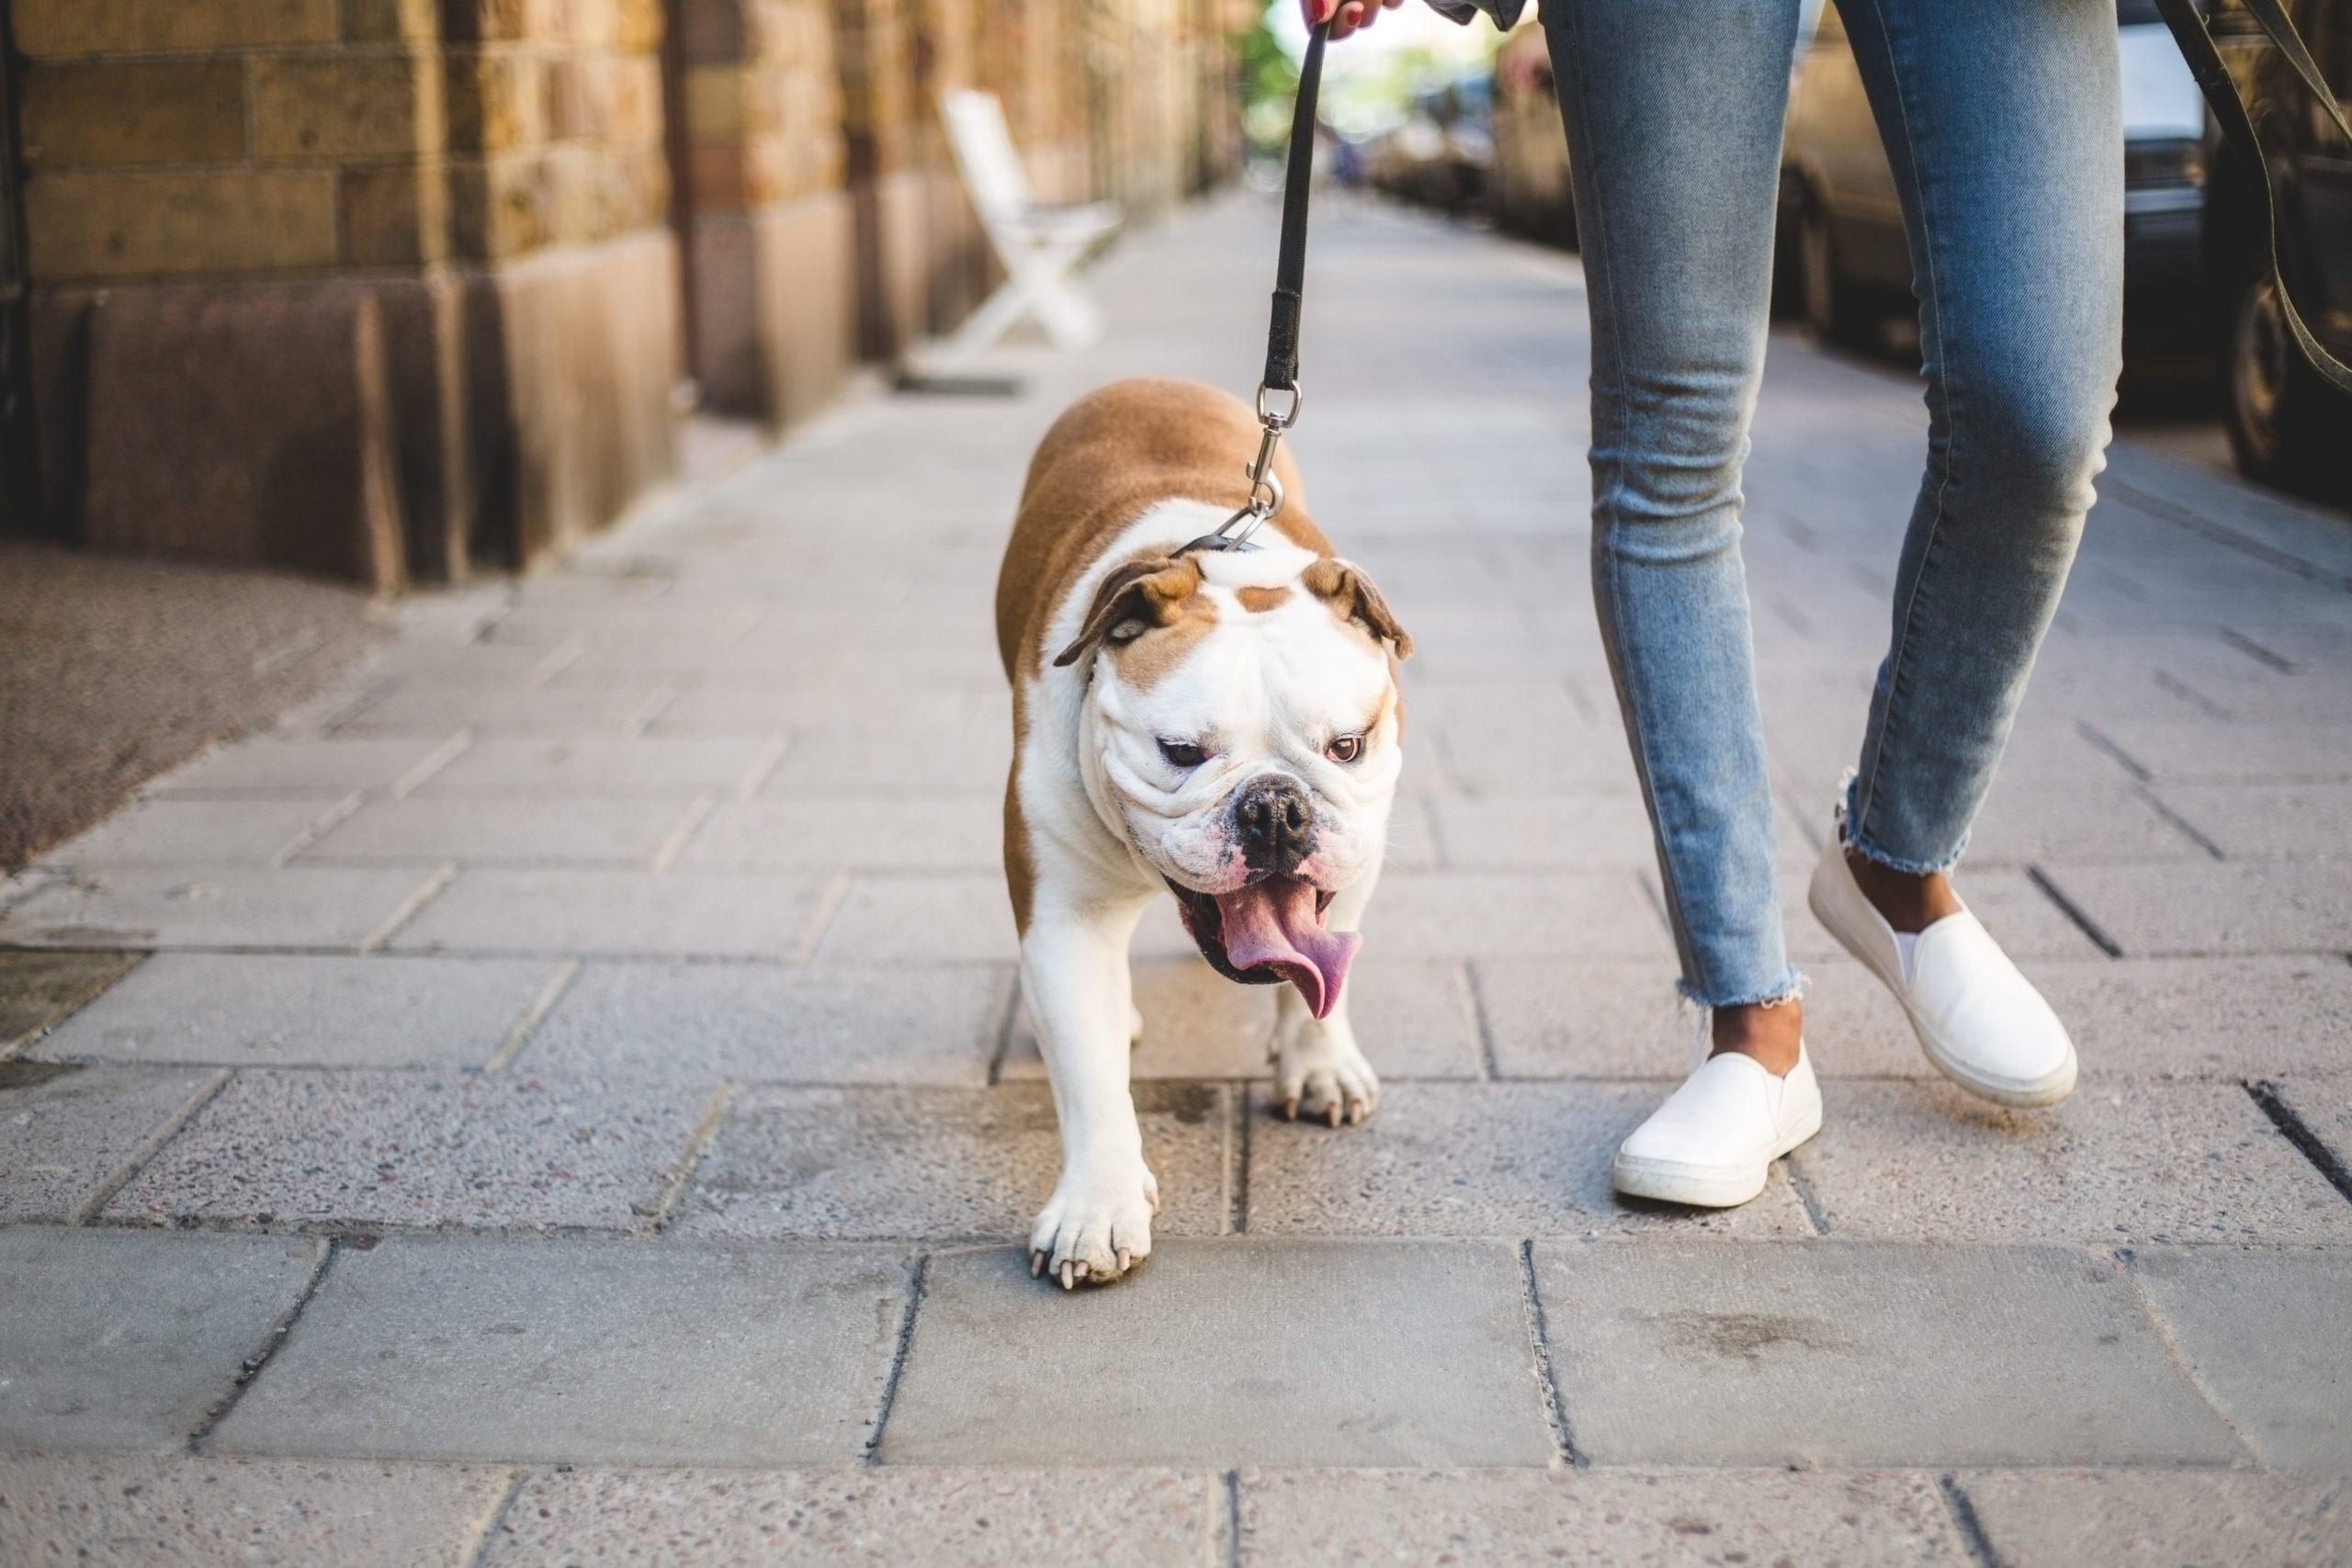 Low section of woman walking with English bulldog on sidewalk